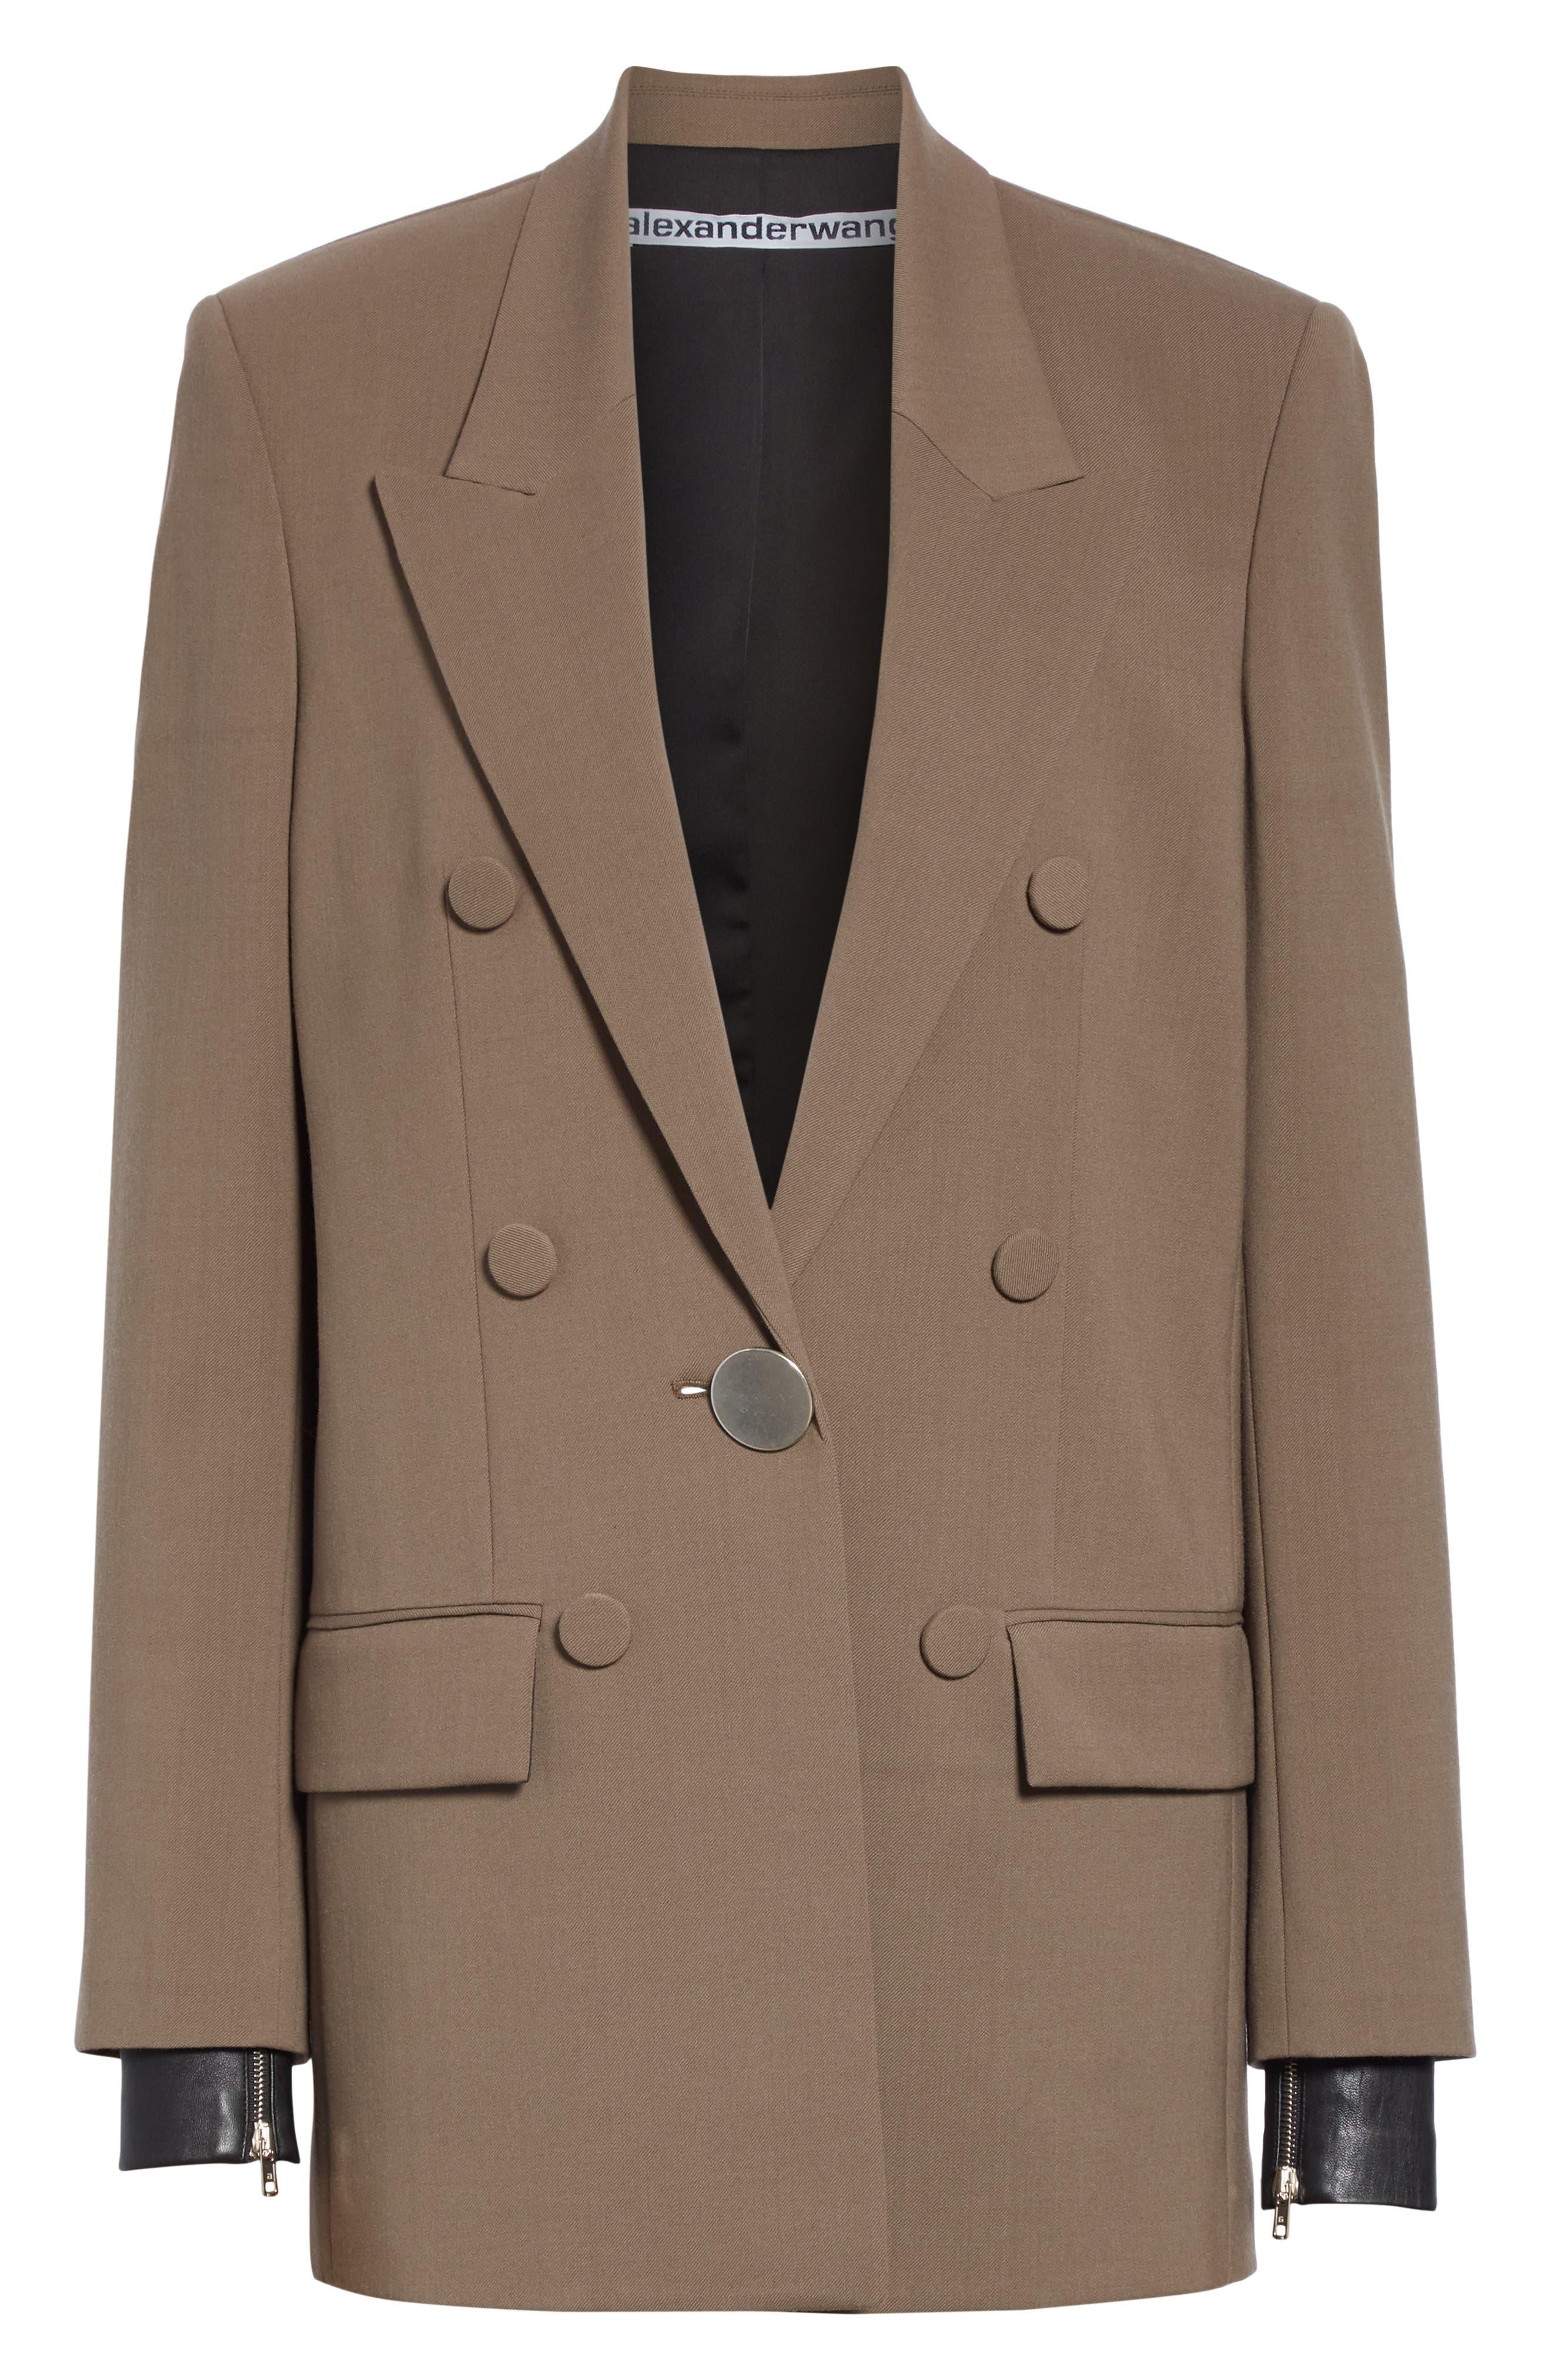 ALEXANDER WANG,                             Leather Cuff Blazer,                             Alternate thumbnail 6, color,                             KHAKI GREEN